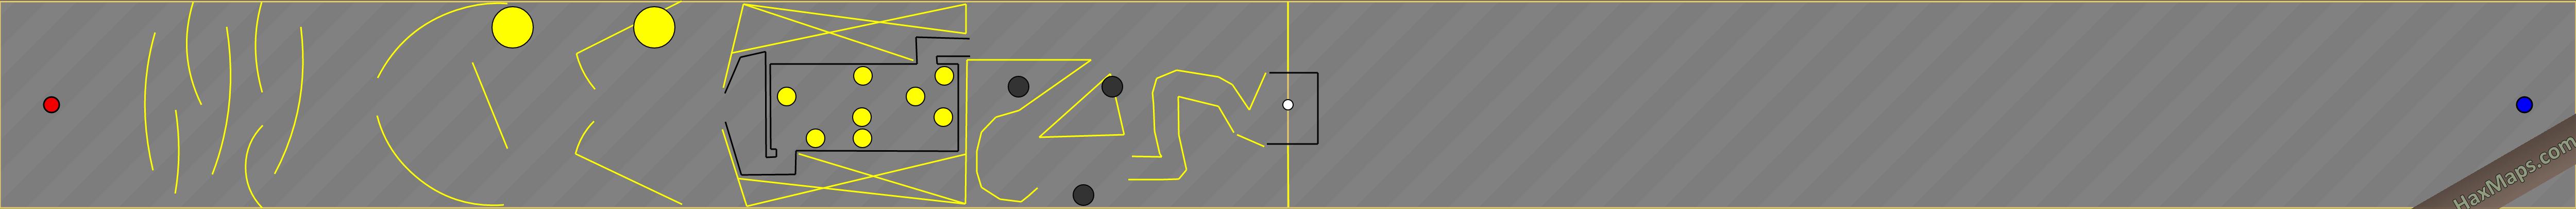 hax ball maps   Yellow1 by XavierM